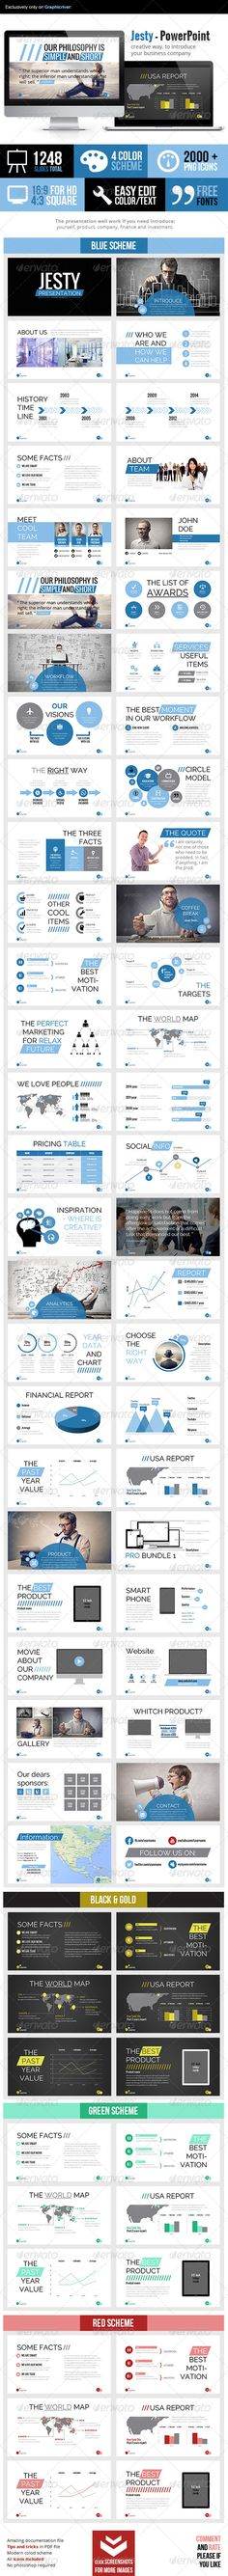 Jesty Powerpoint Presentation - Business Powerpoint Templates